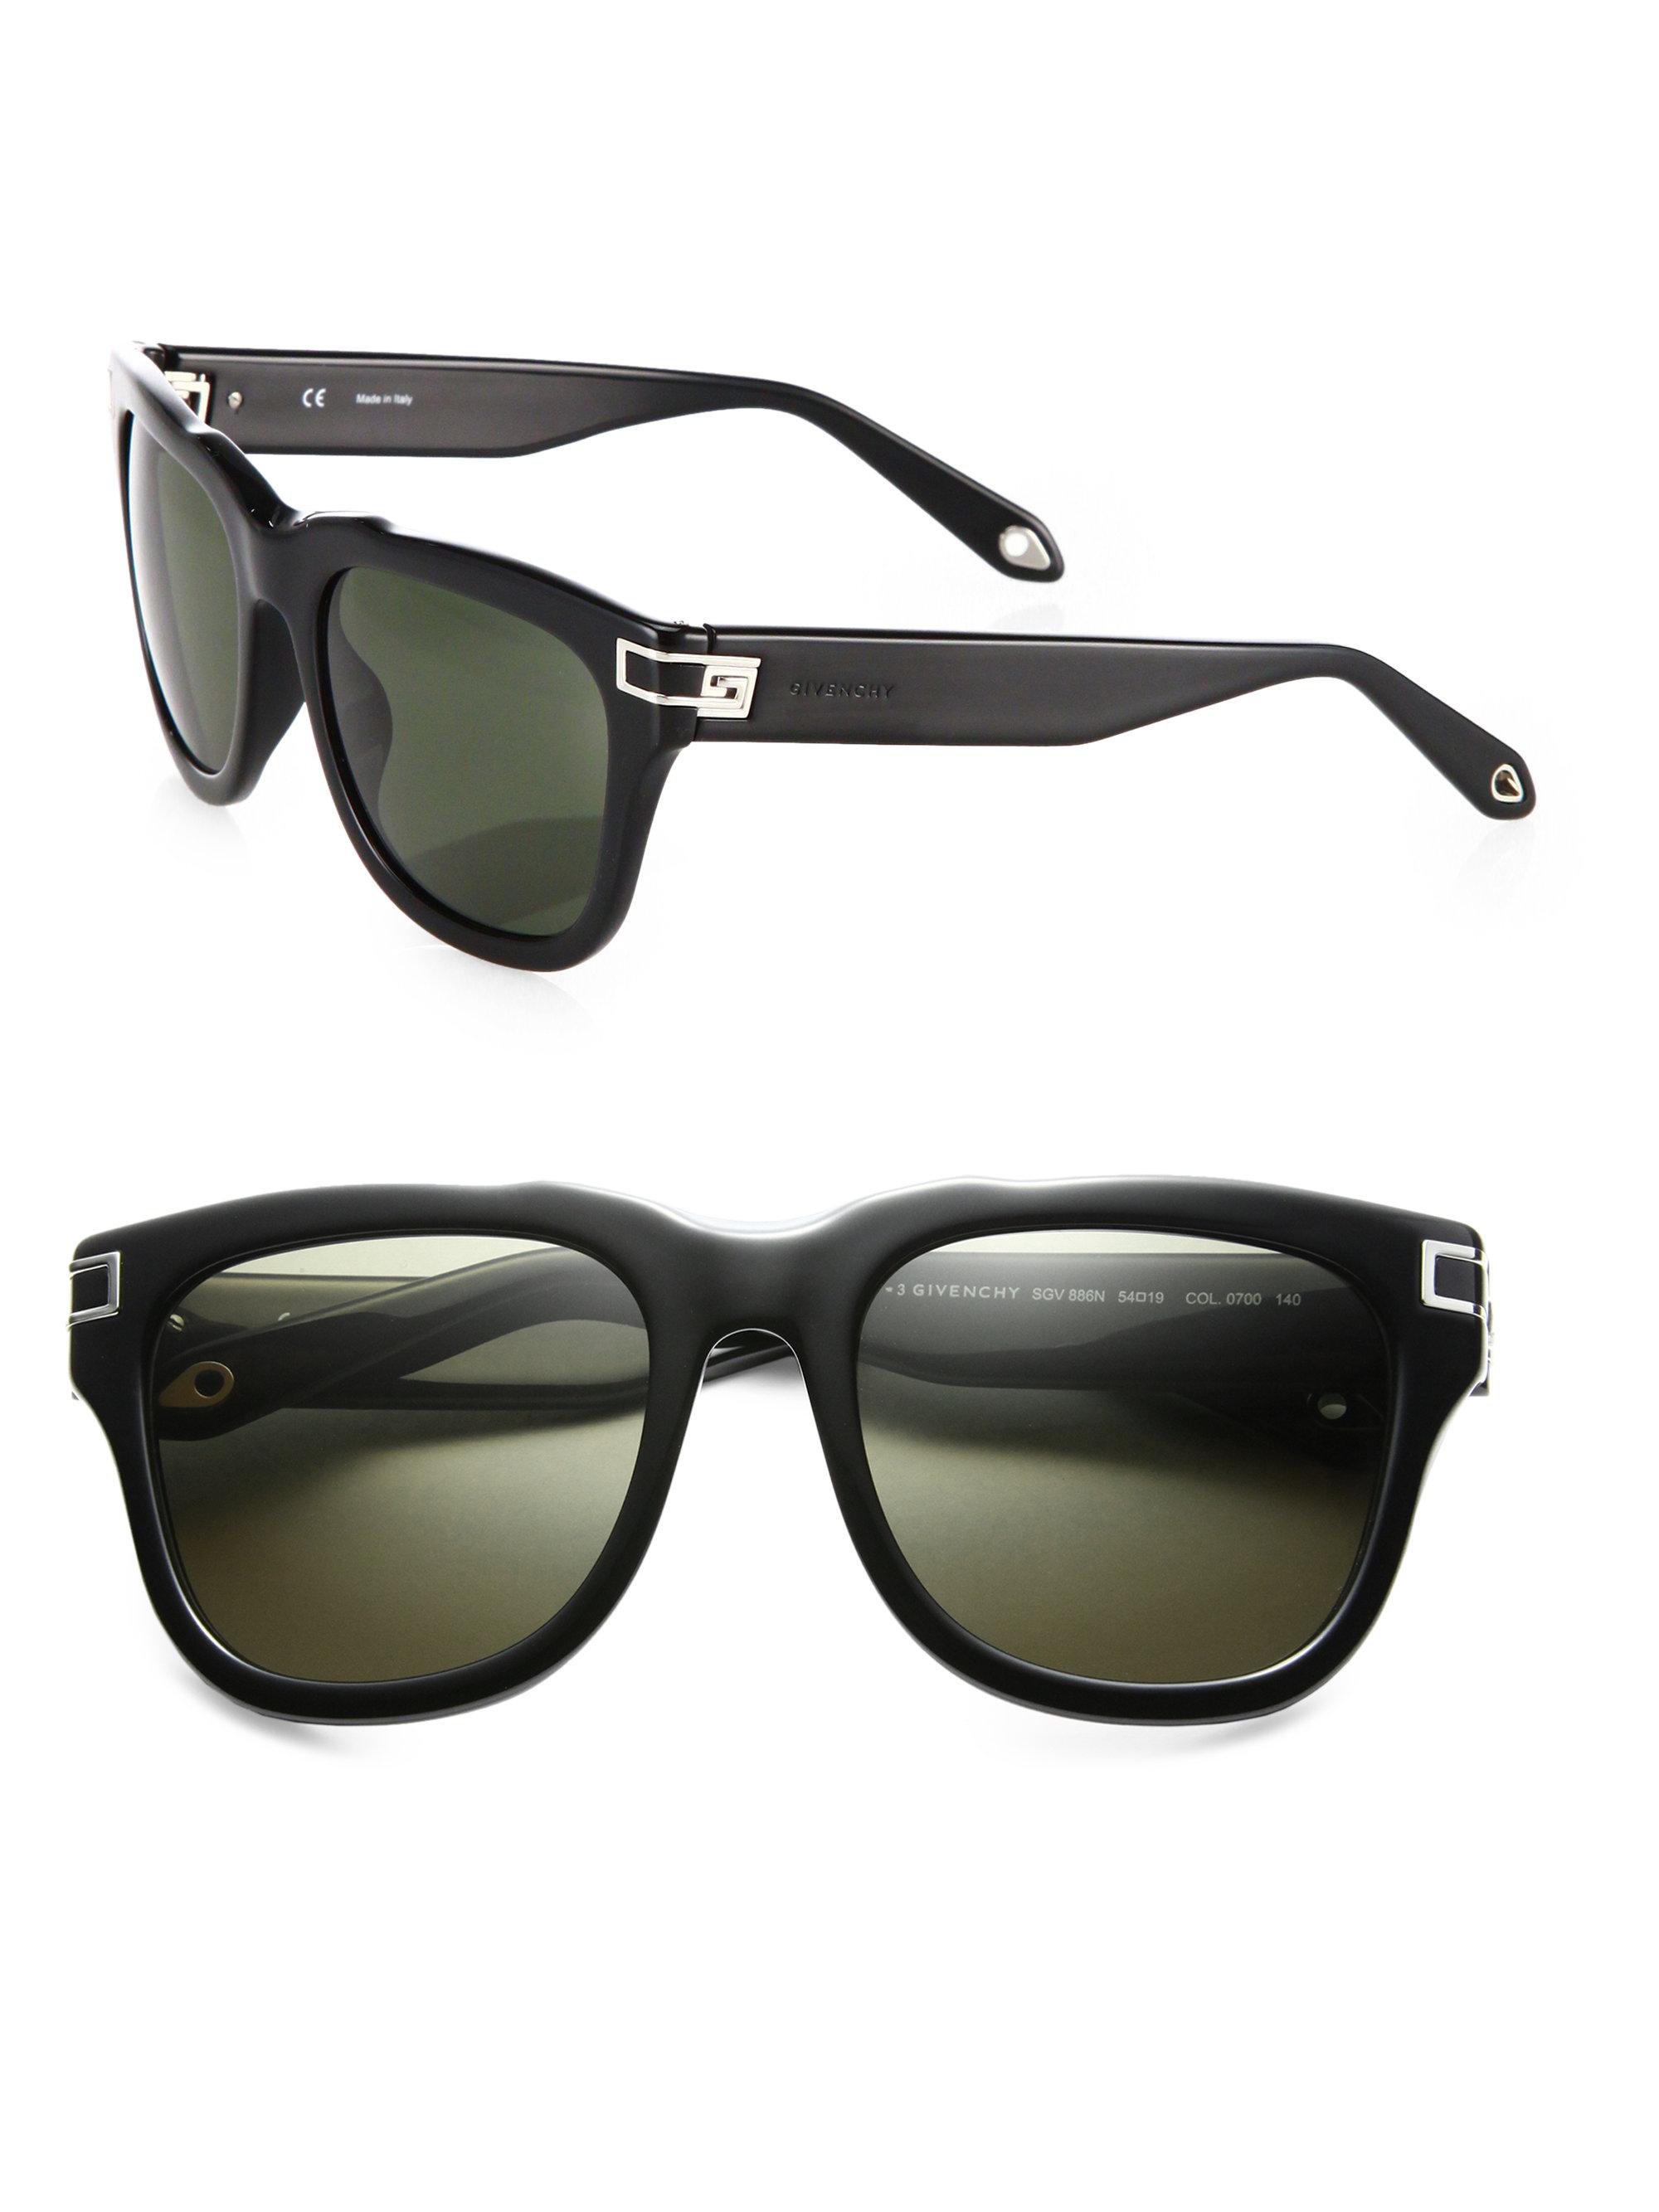 6e0916622aa Givenchy Resin Wayfarer Sunglasses in Black for Men - Lyst